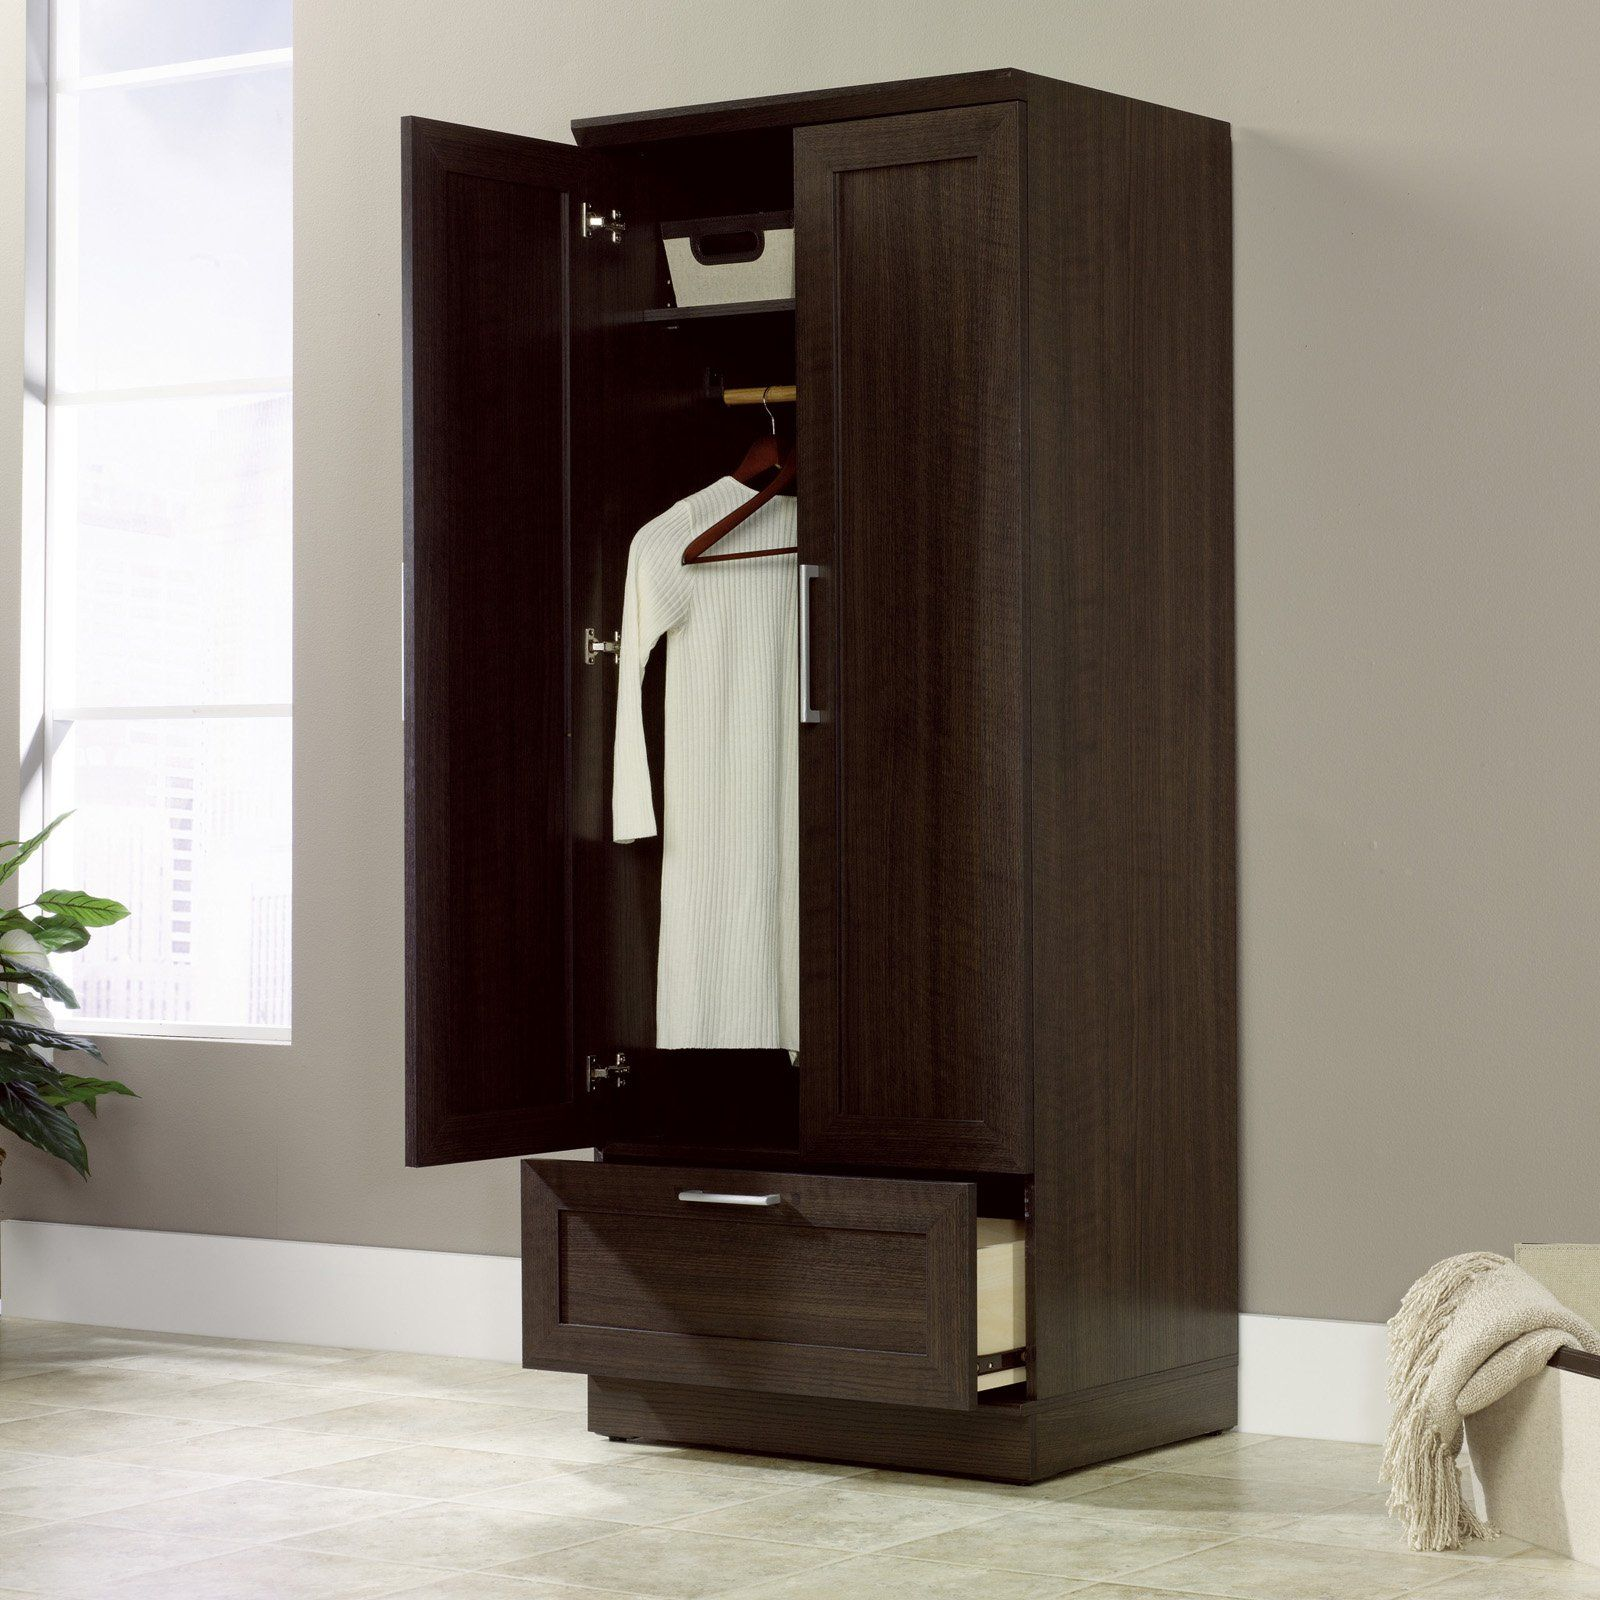 Sauder Homeplus Wardrobe Cabinet   Closet Organizers At Hayneedle $176.99